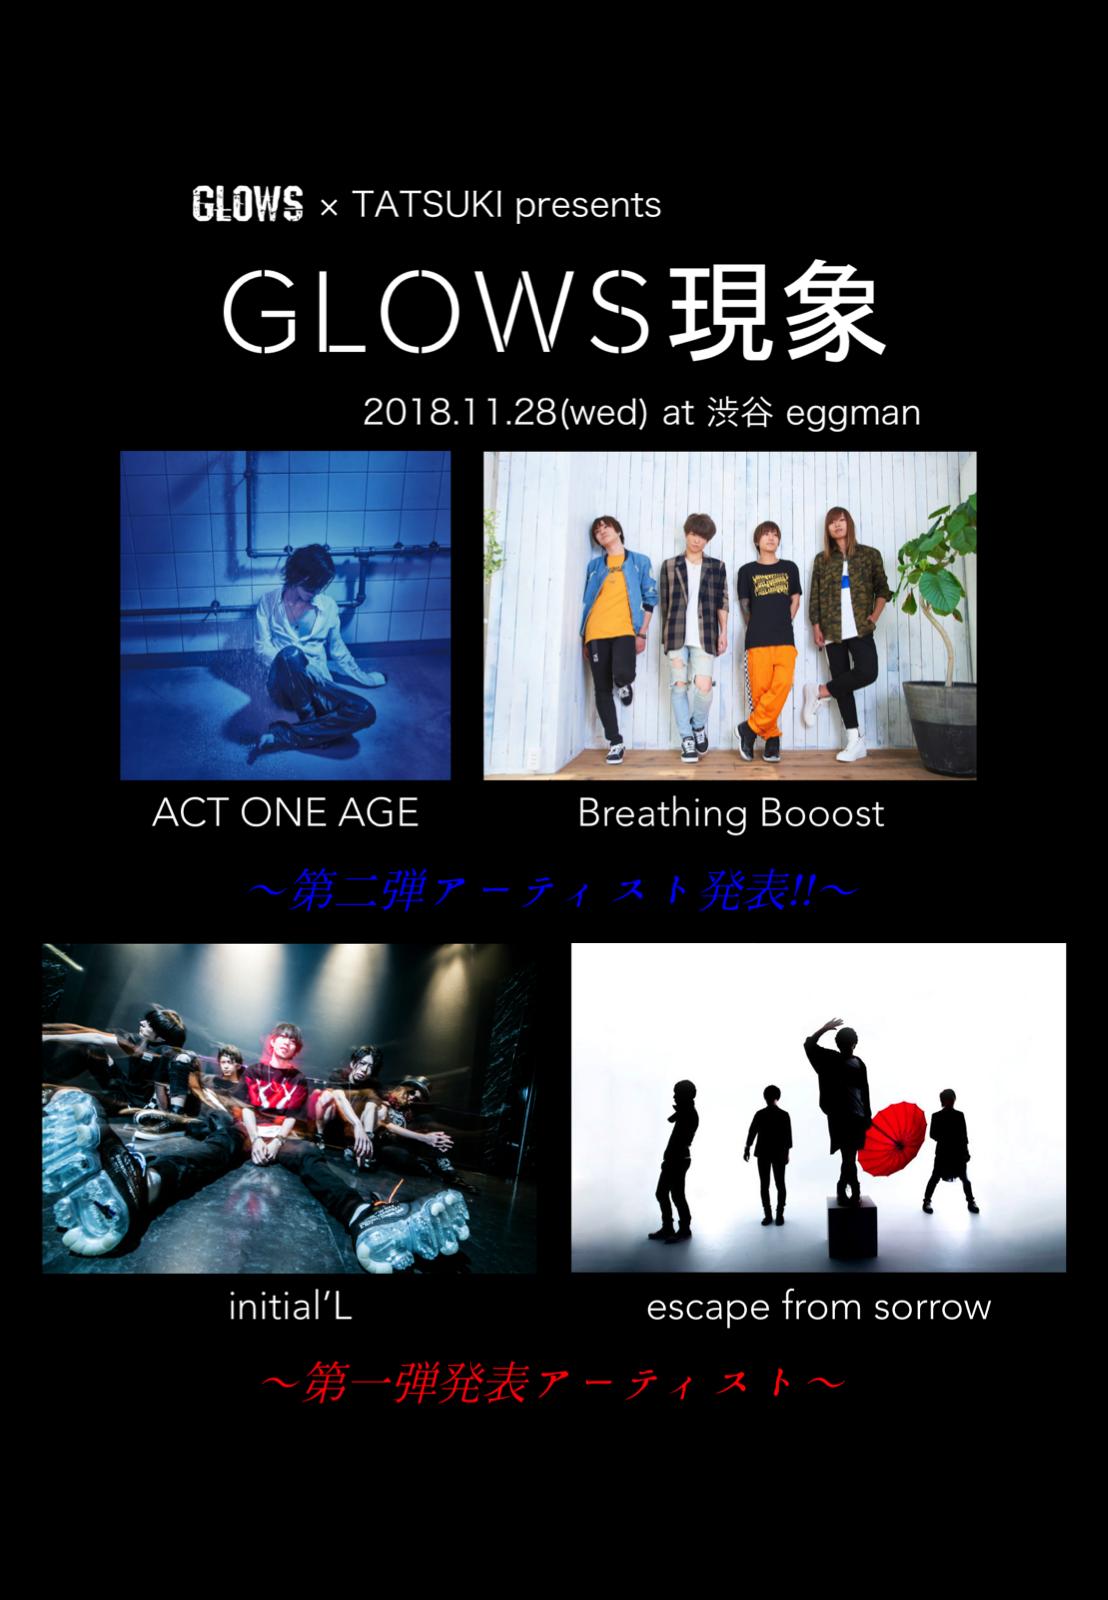 GLOWS × TATSUKI presents GLOWS現象